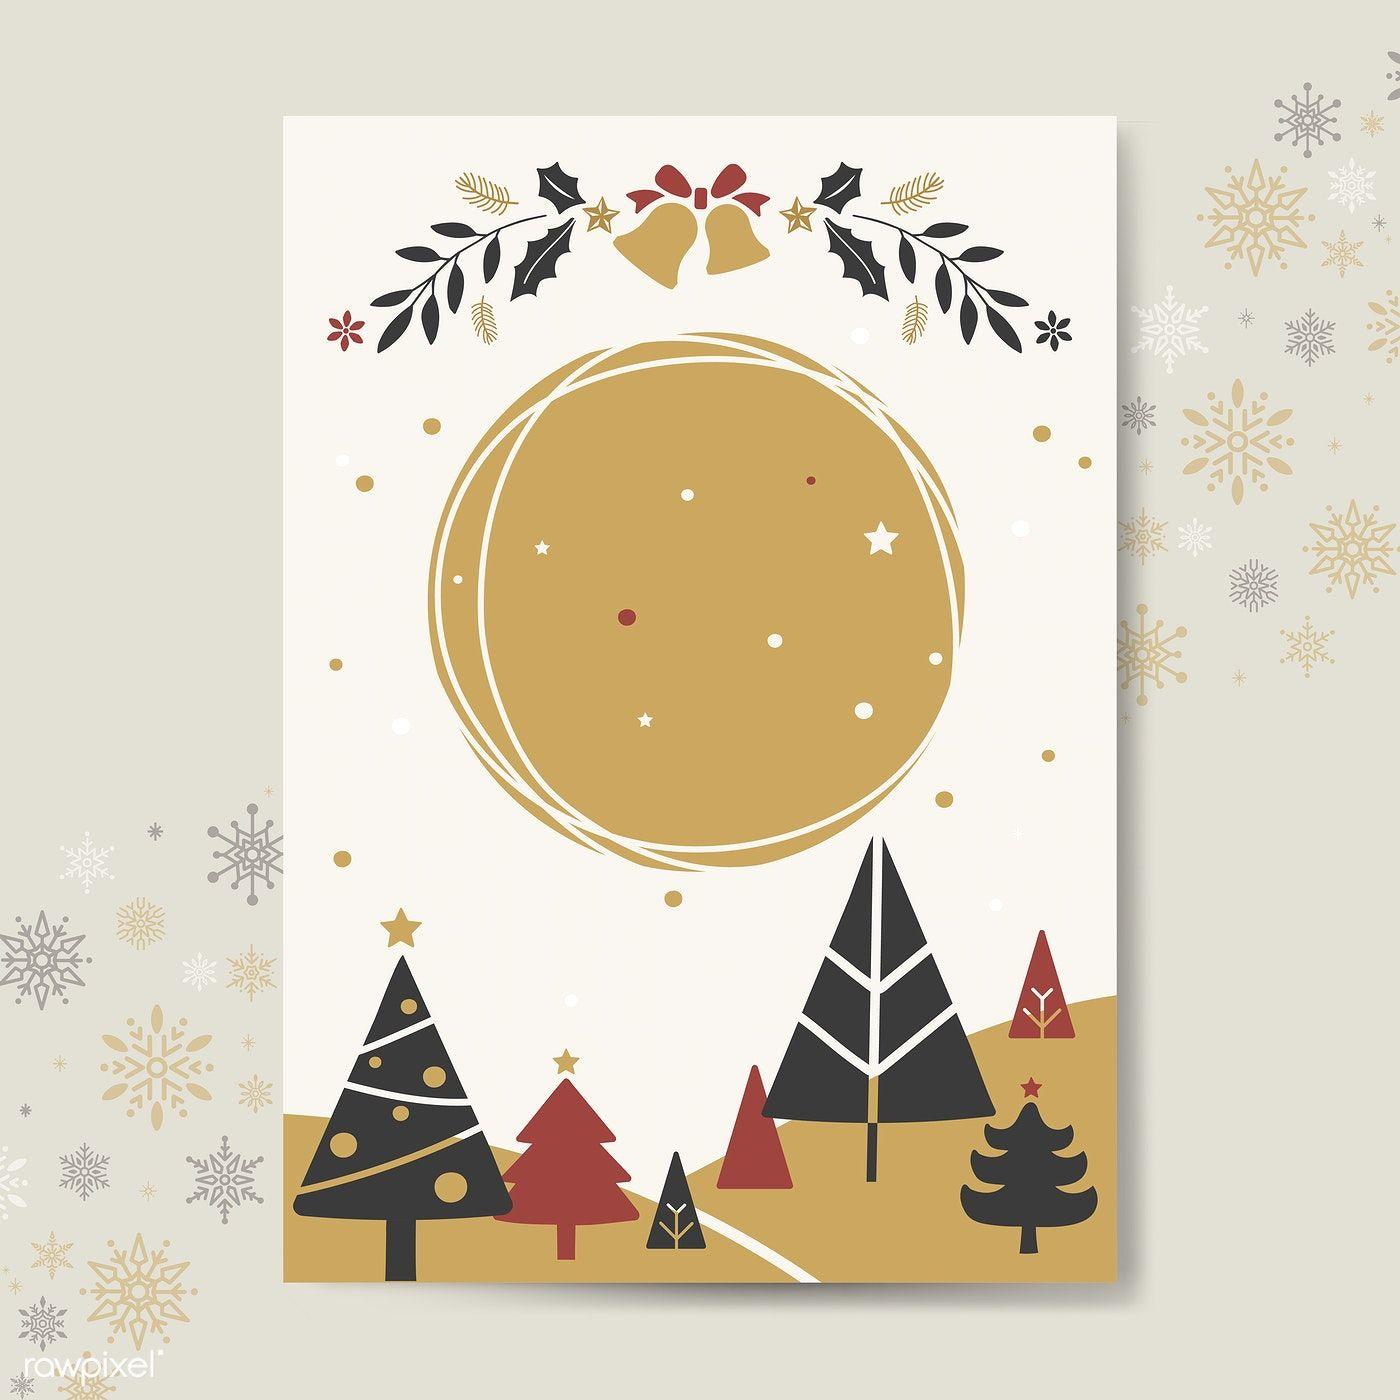 Christmas greeting card mockup vector free image by